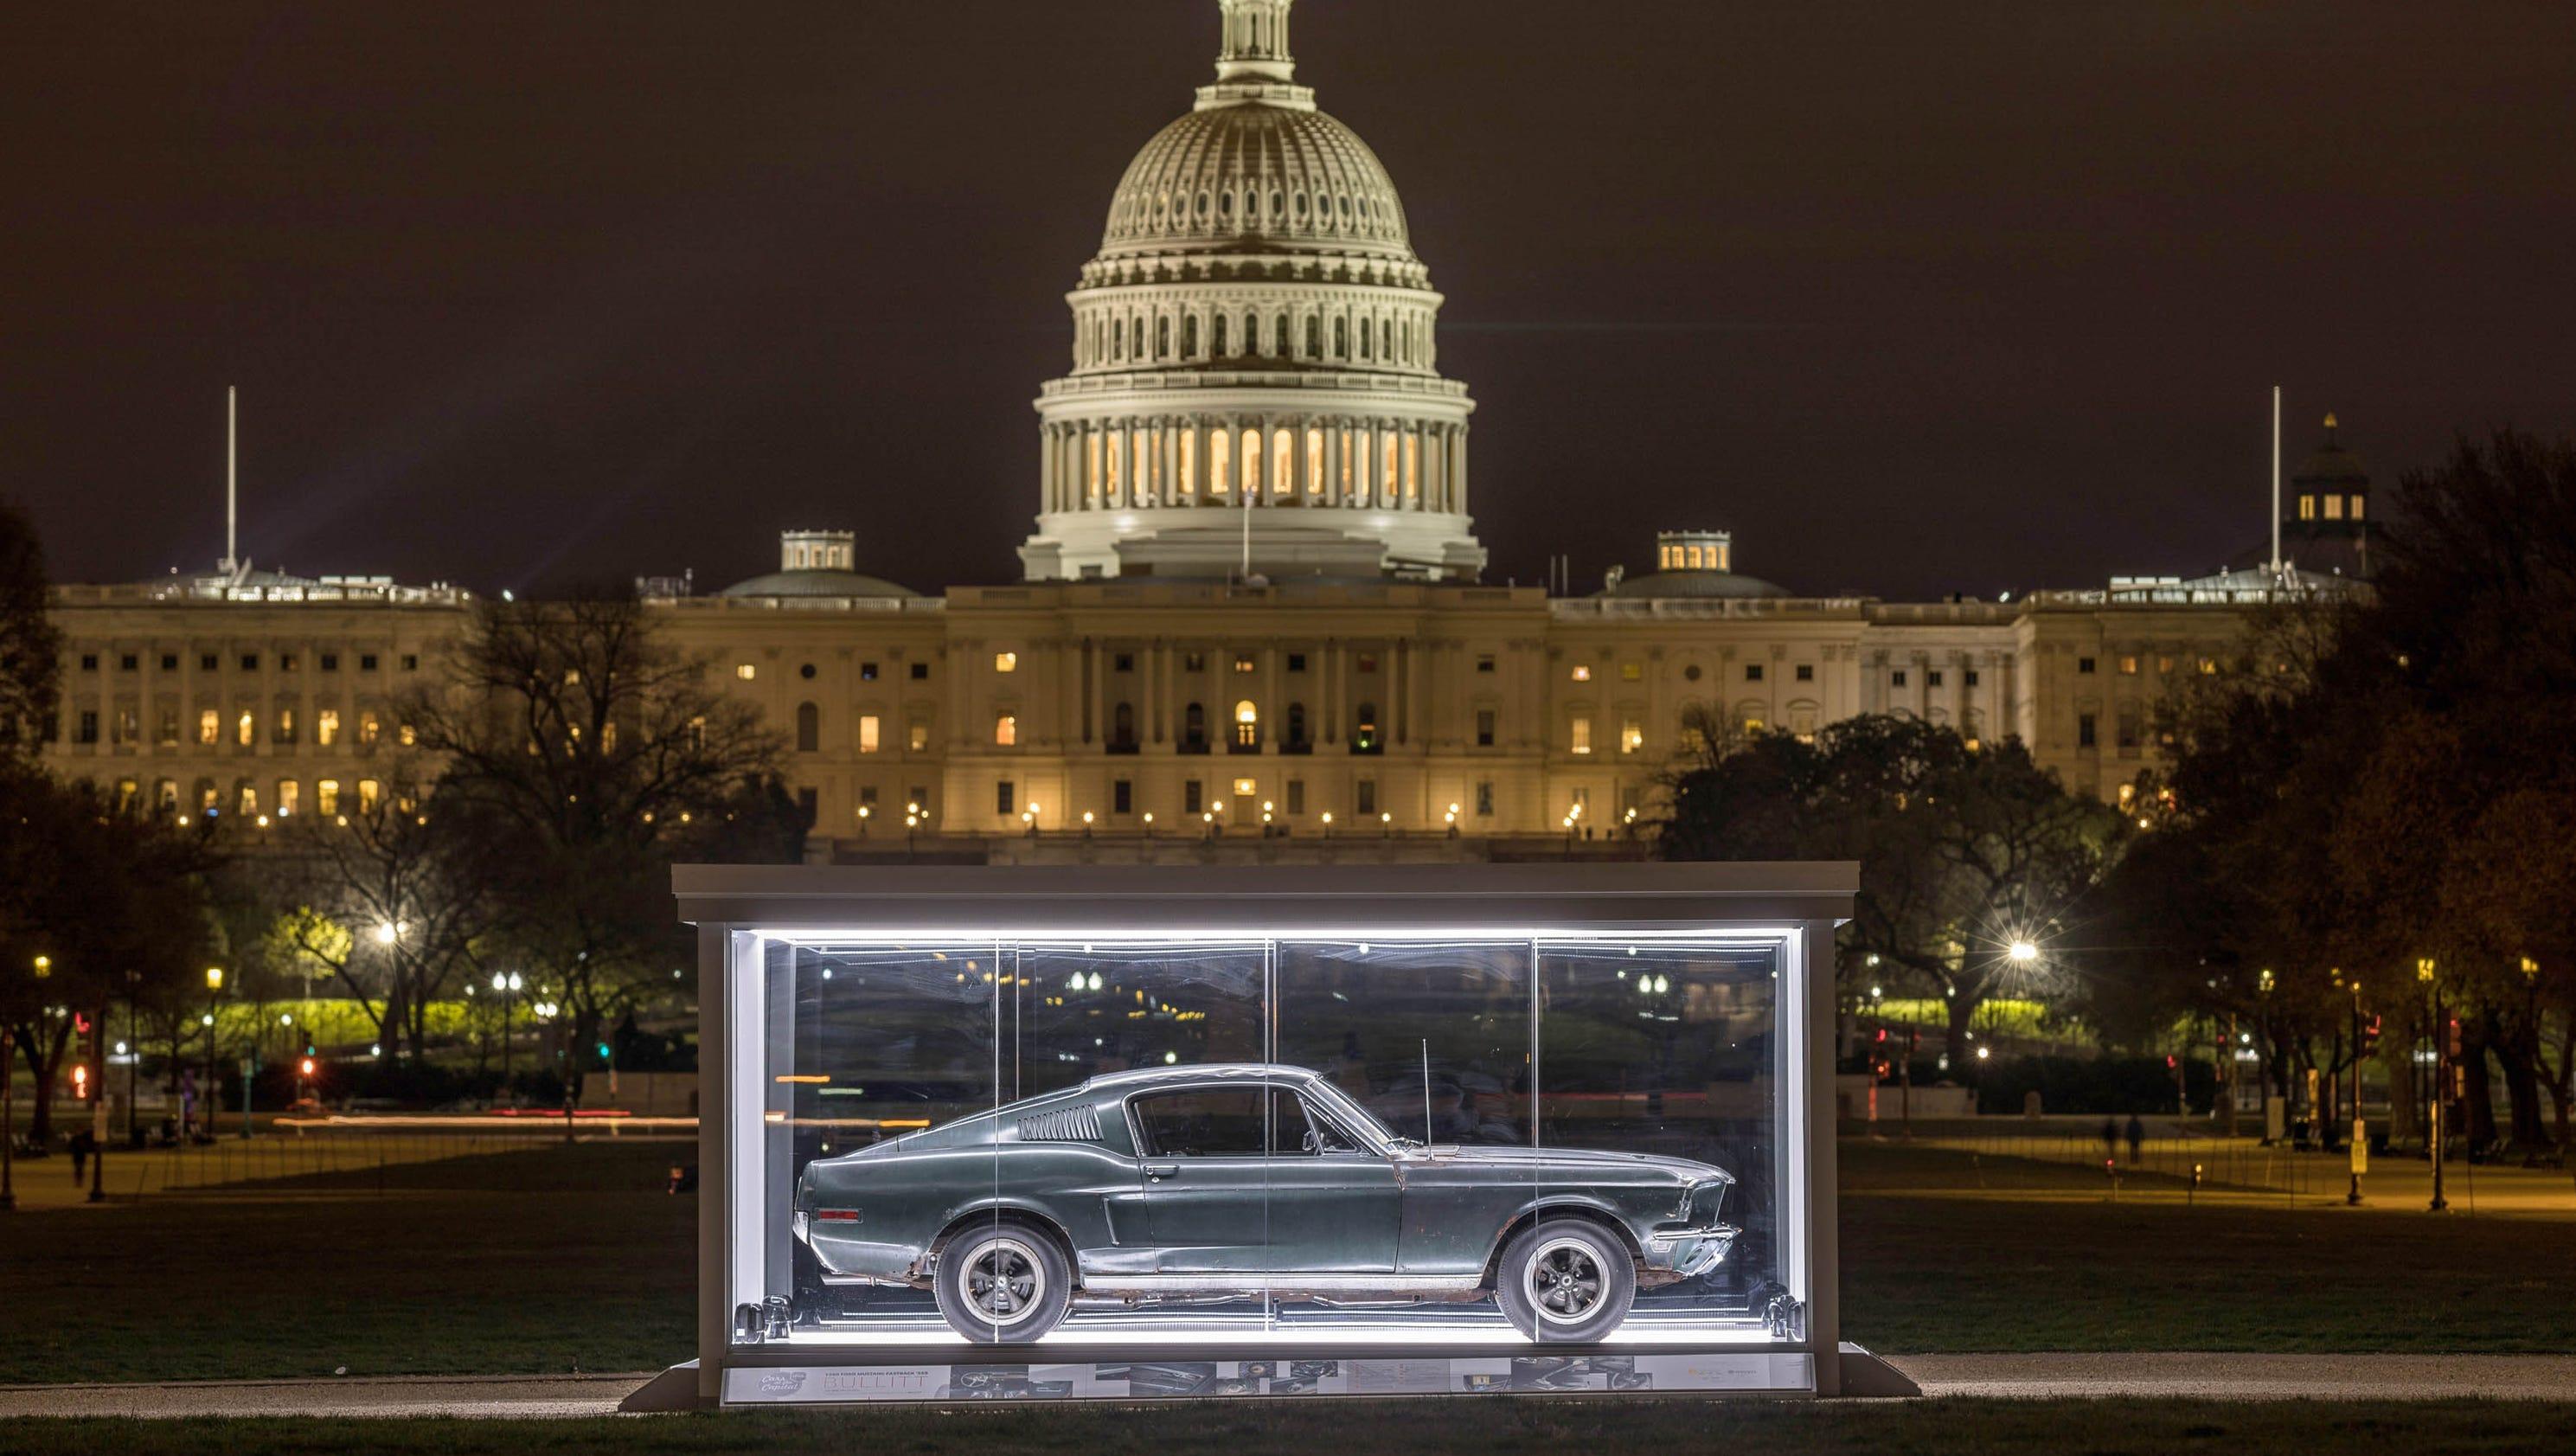 Photos 68 Bullitt Mustang Displayed On National Mall